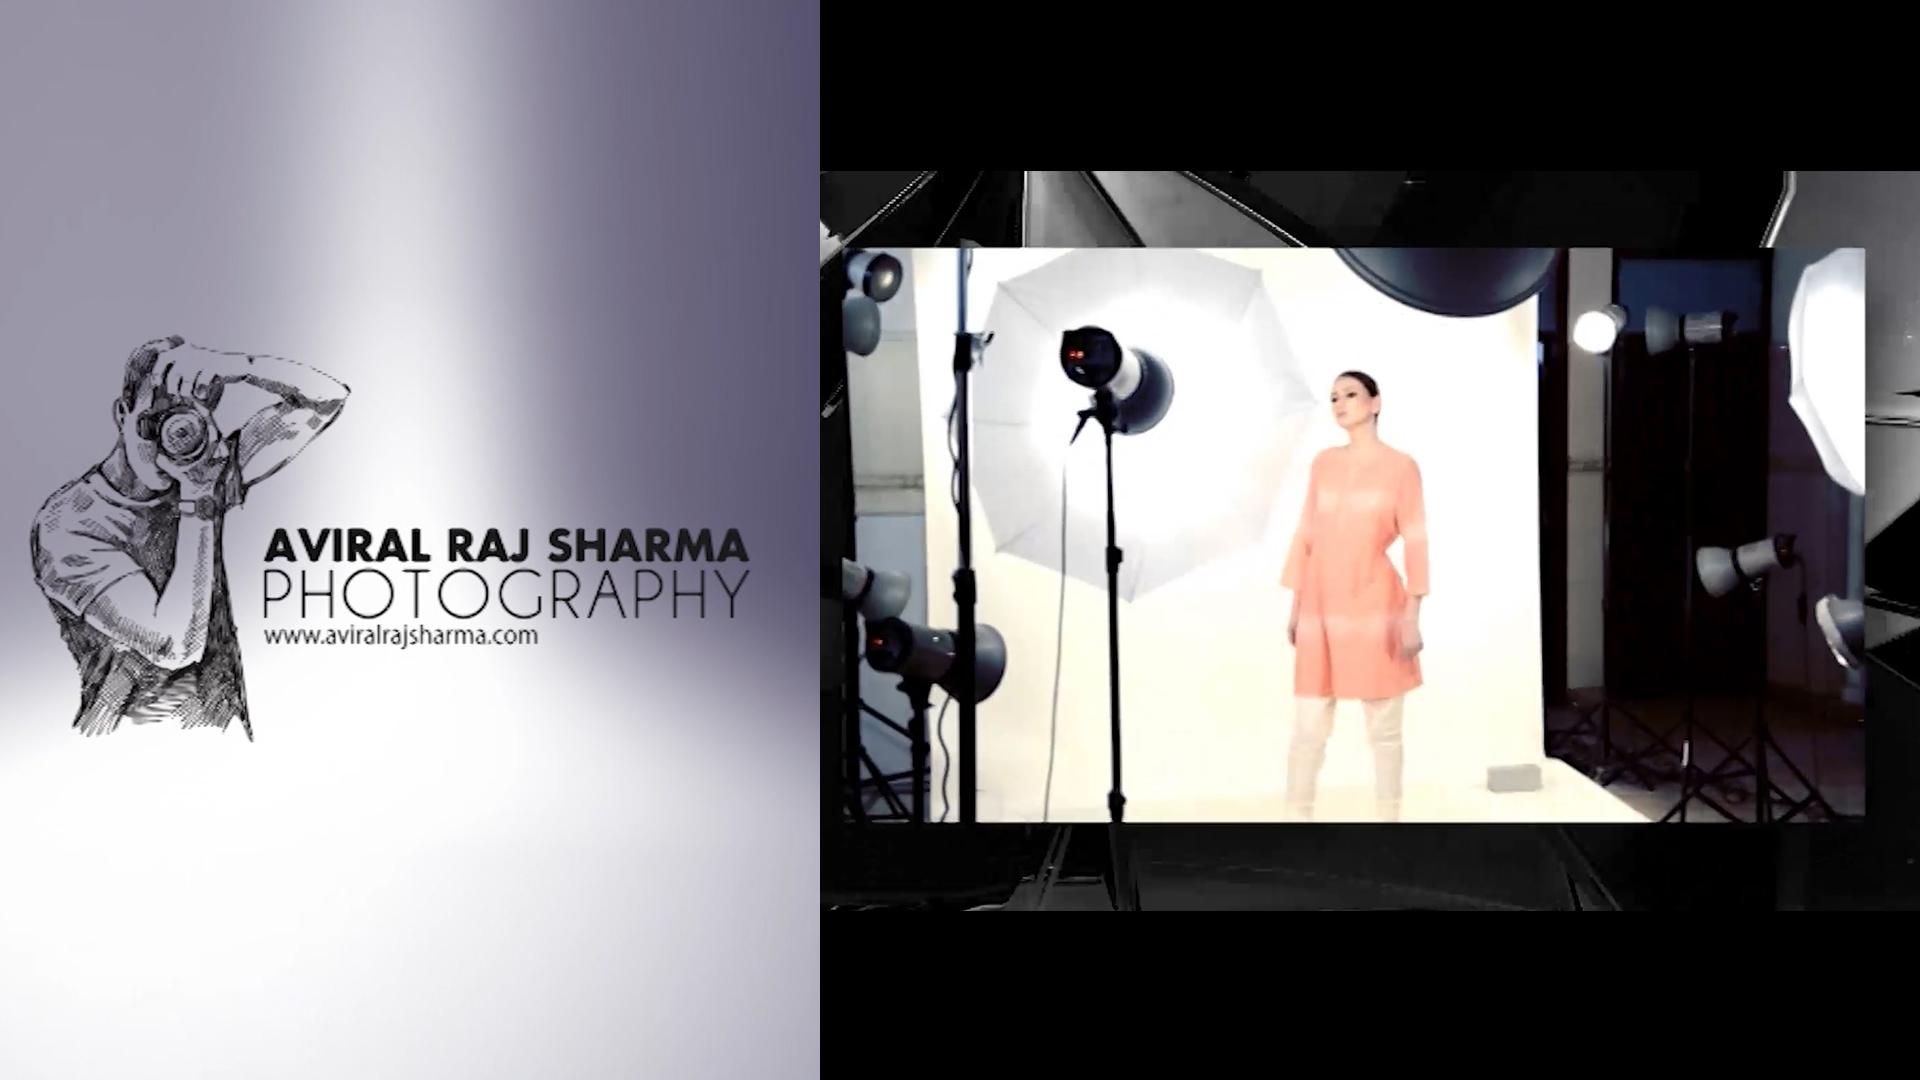 Aviral Raj Sharma Photography Bts - camera-craft